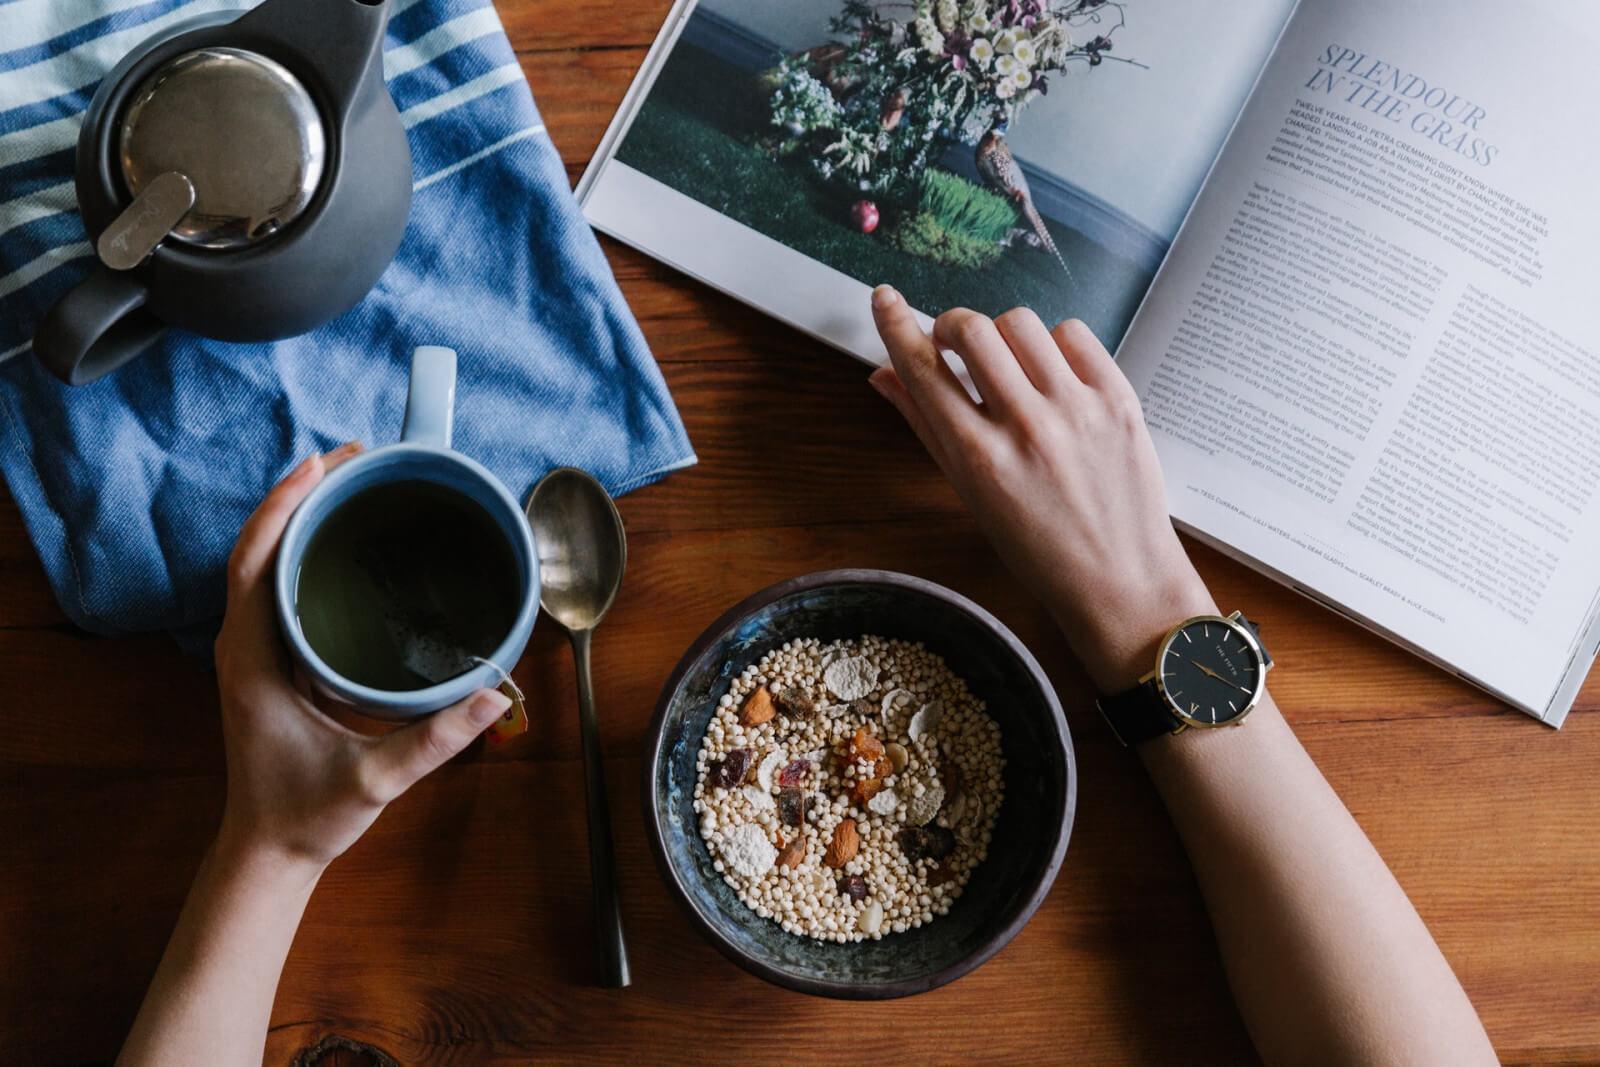 7 Steps To Break Or Make A Habit